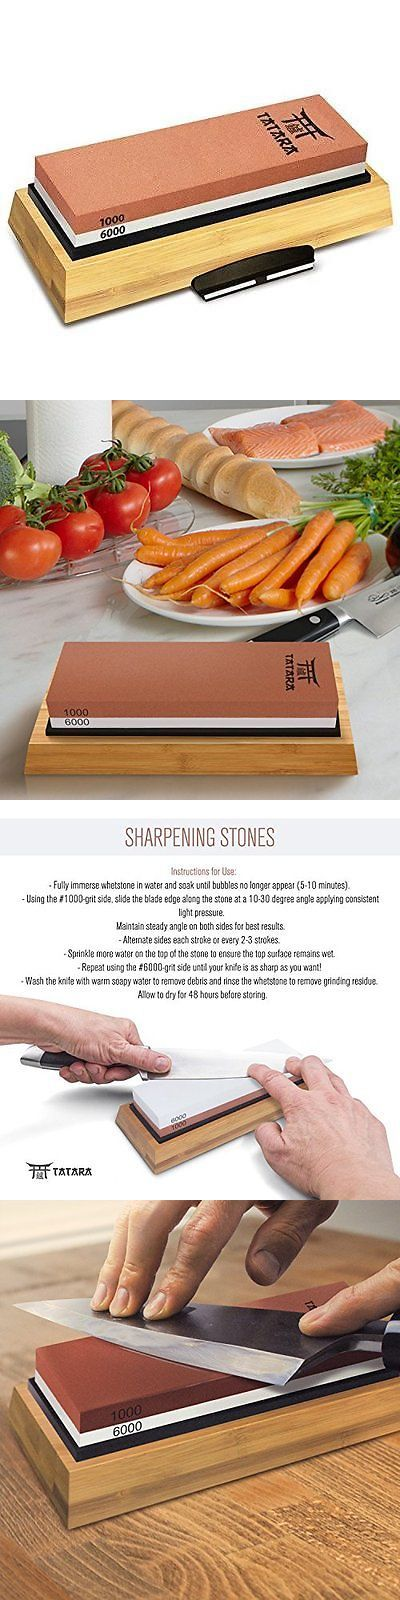 Sharpeners 116005: Tatara Sharpening Stone 1000 And 6000 Grit - Double Sided Japanese Whetstone Set -> BUY IT NOW ONLY: $94.93 on eBay!